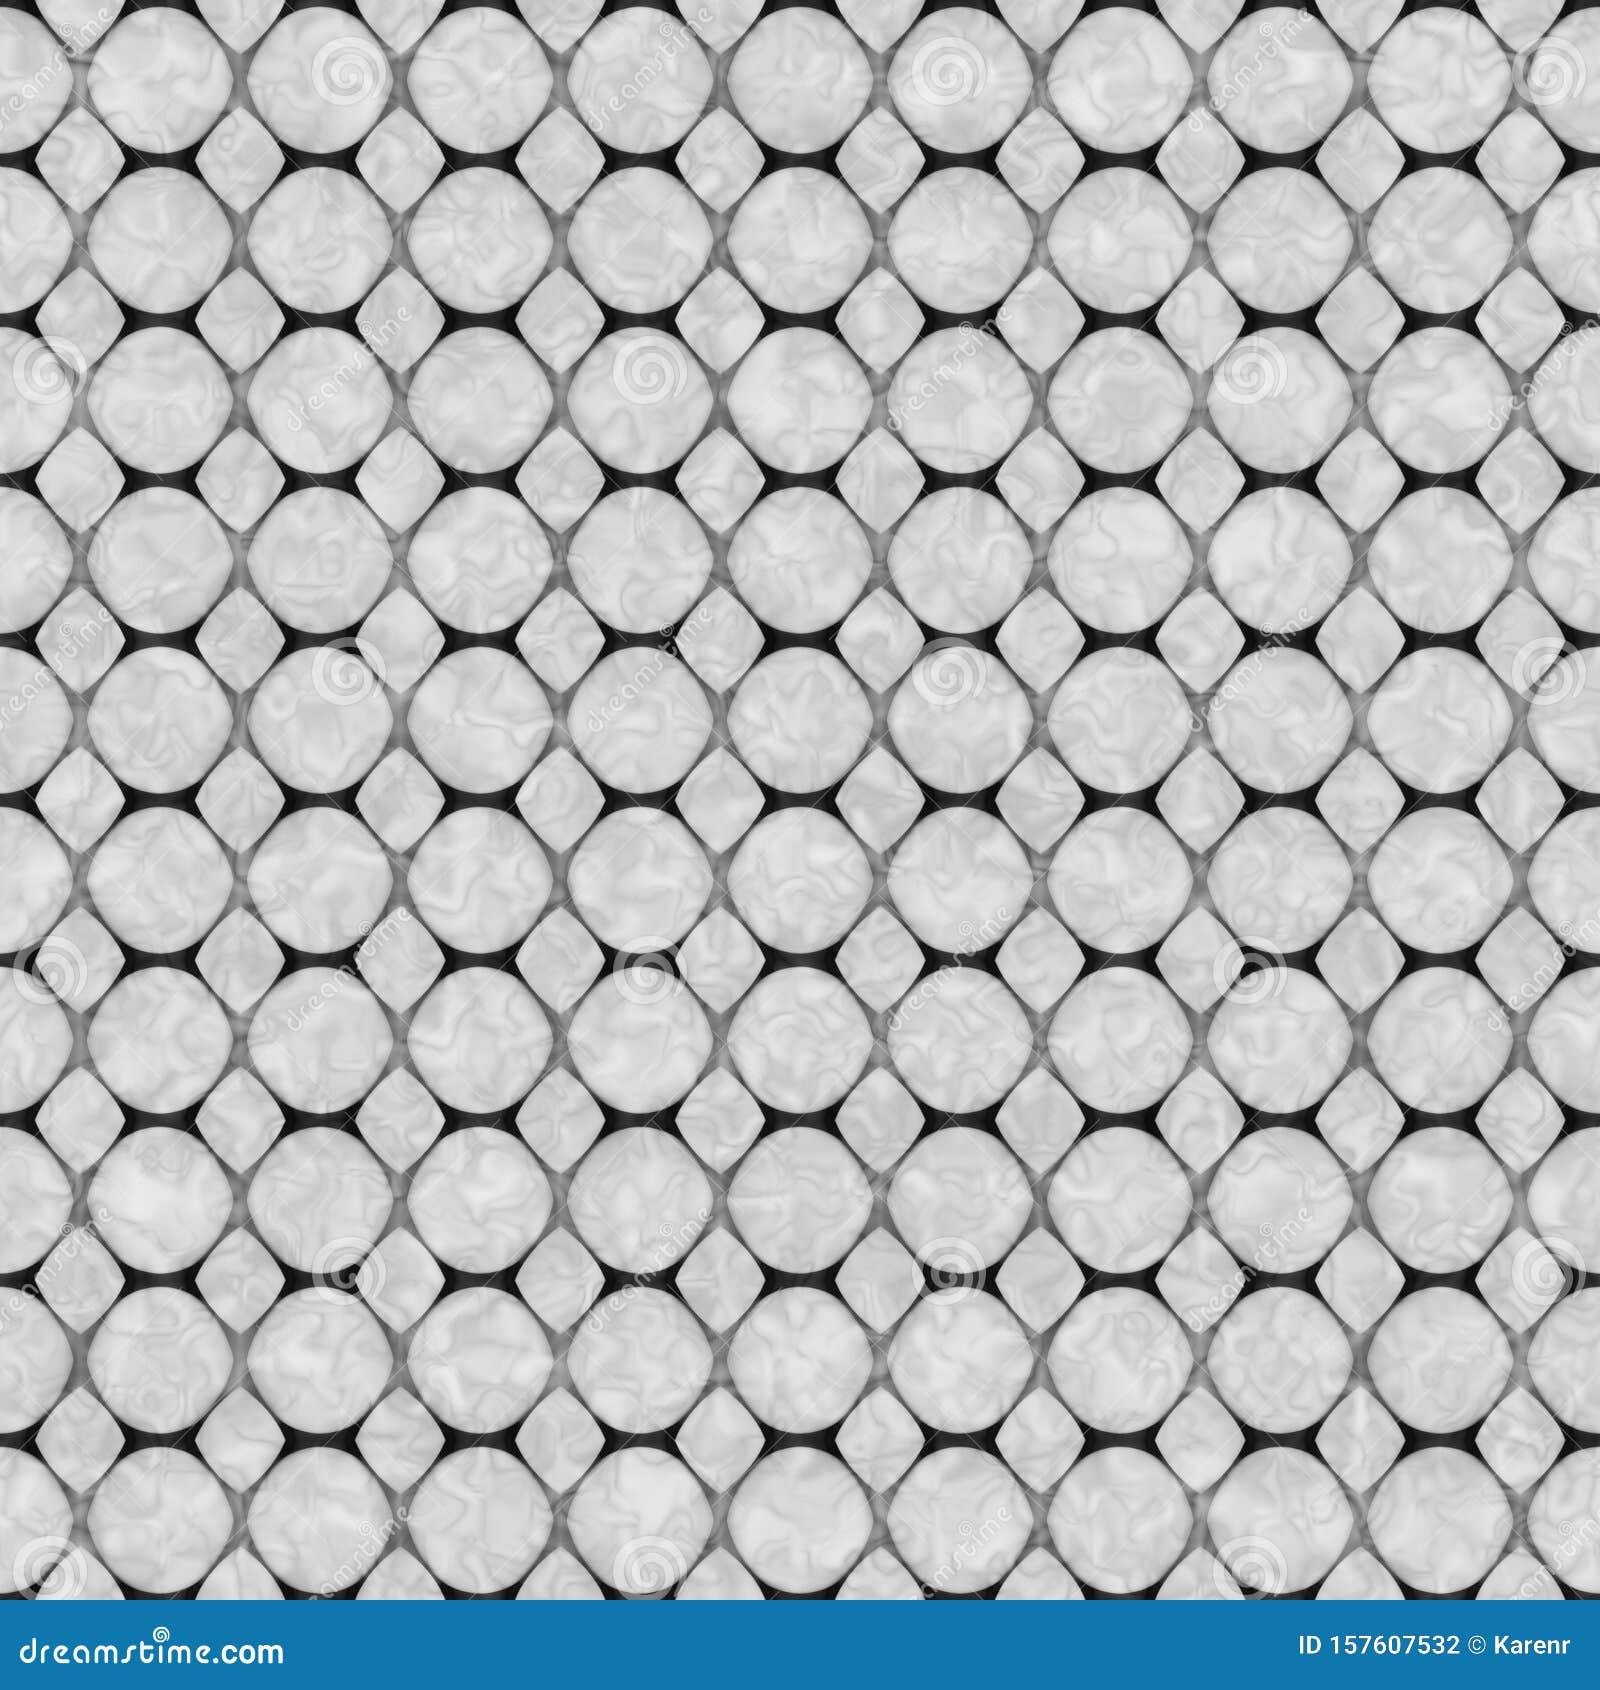 Gray Honeycomb Abstract Geometric Seamless Textured